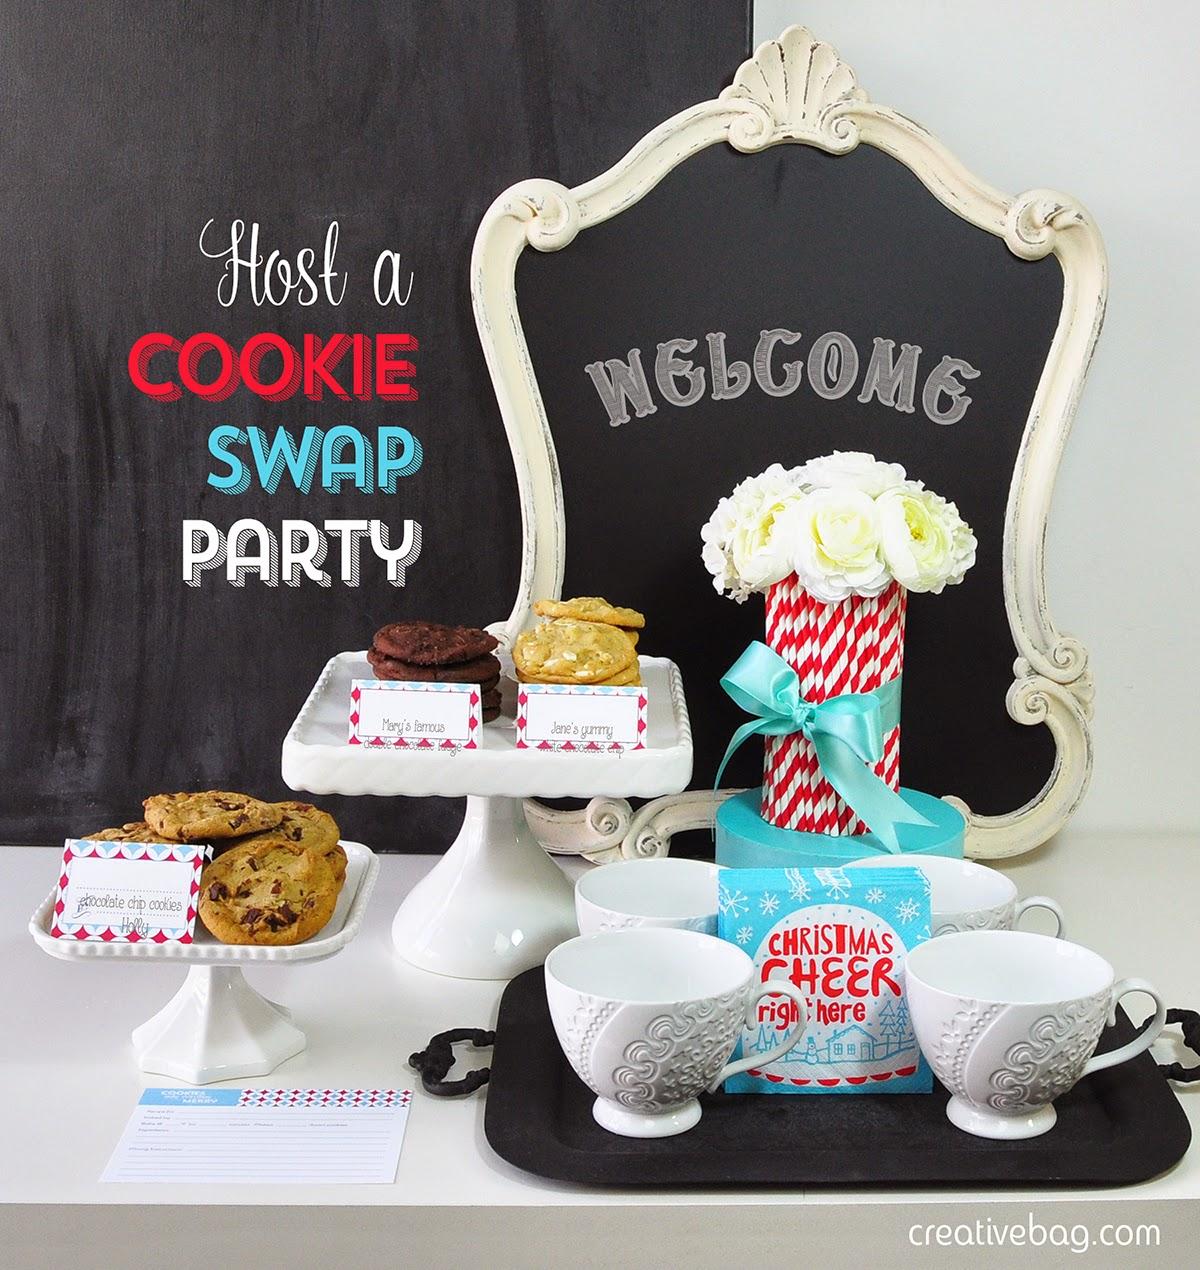 host a cookie swap party and free printables | creativebag.com